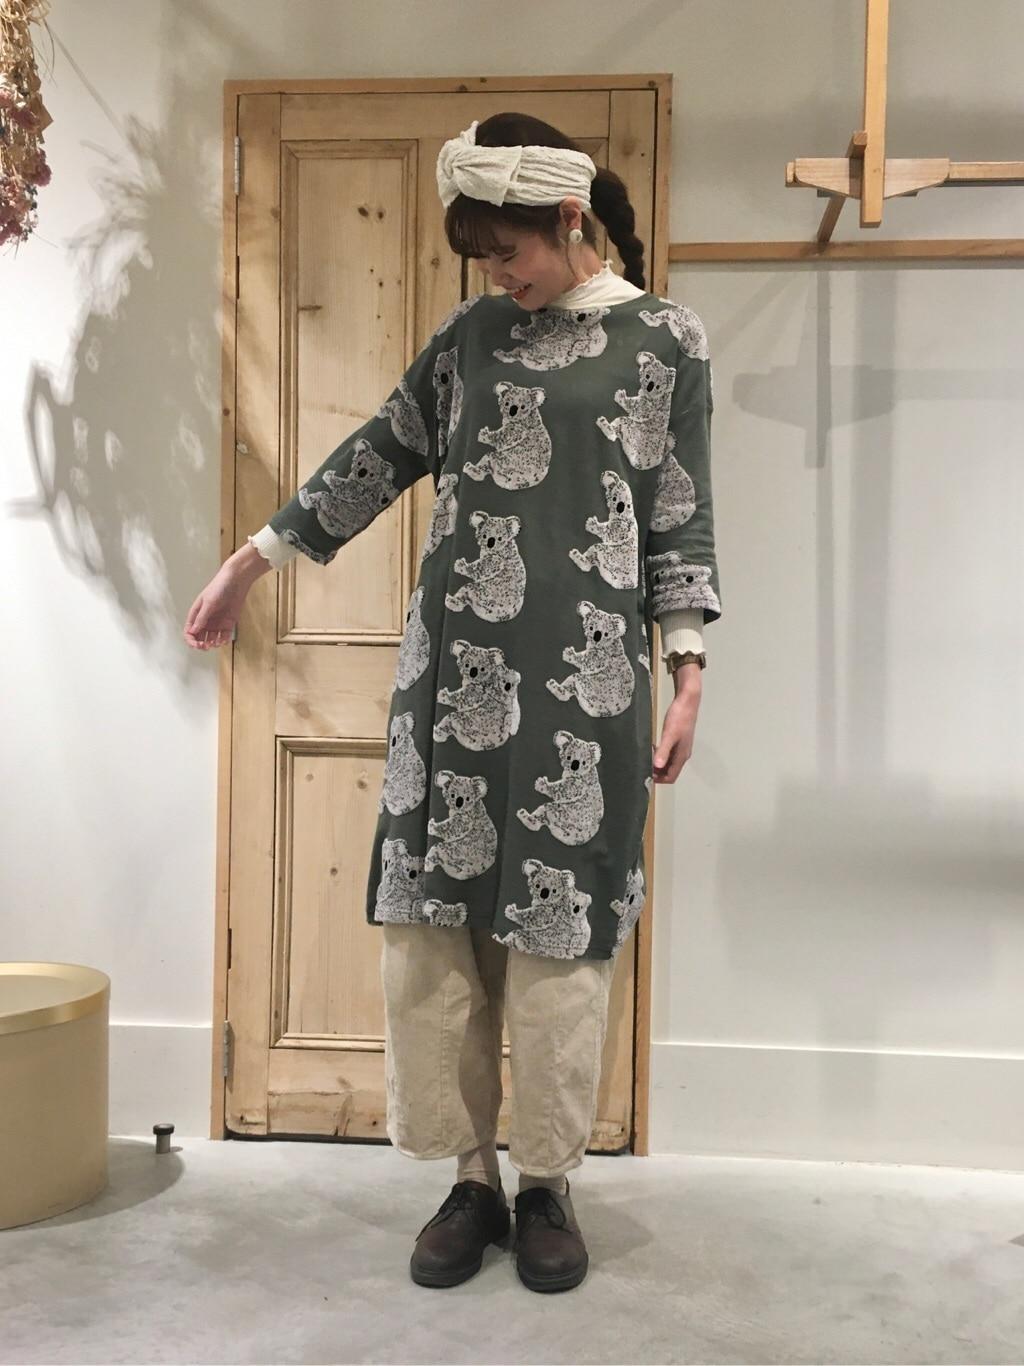 Malle chambre de charme 調布パルコ 身長:167cm 2020.01.26